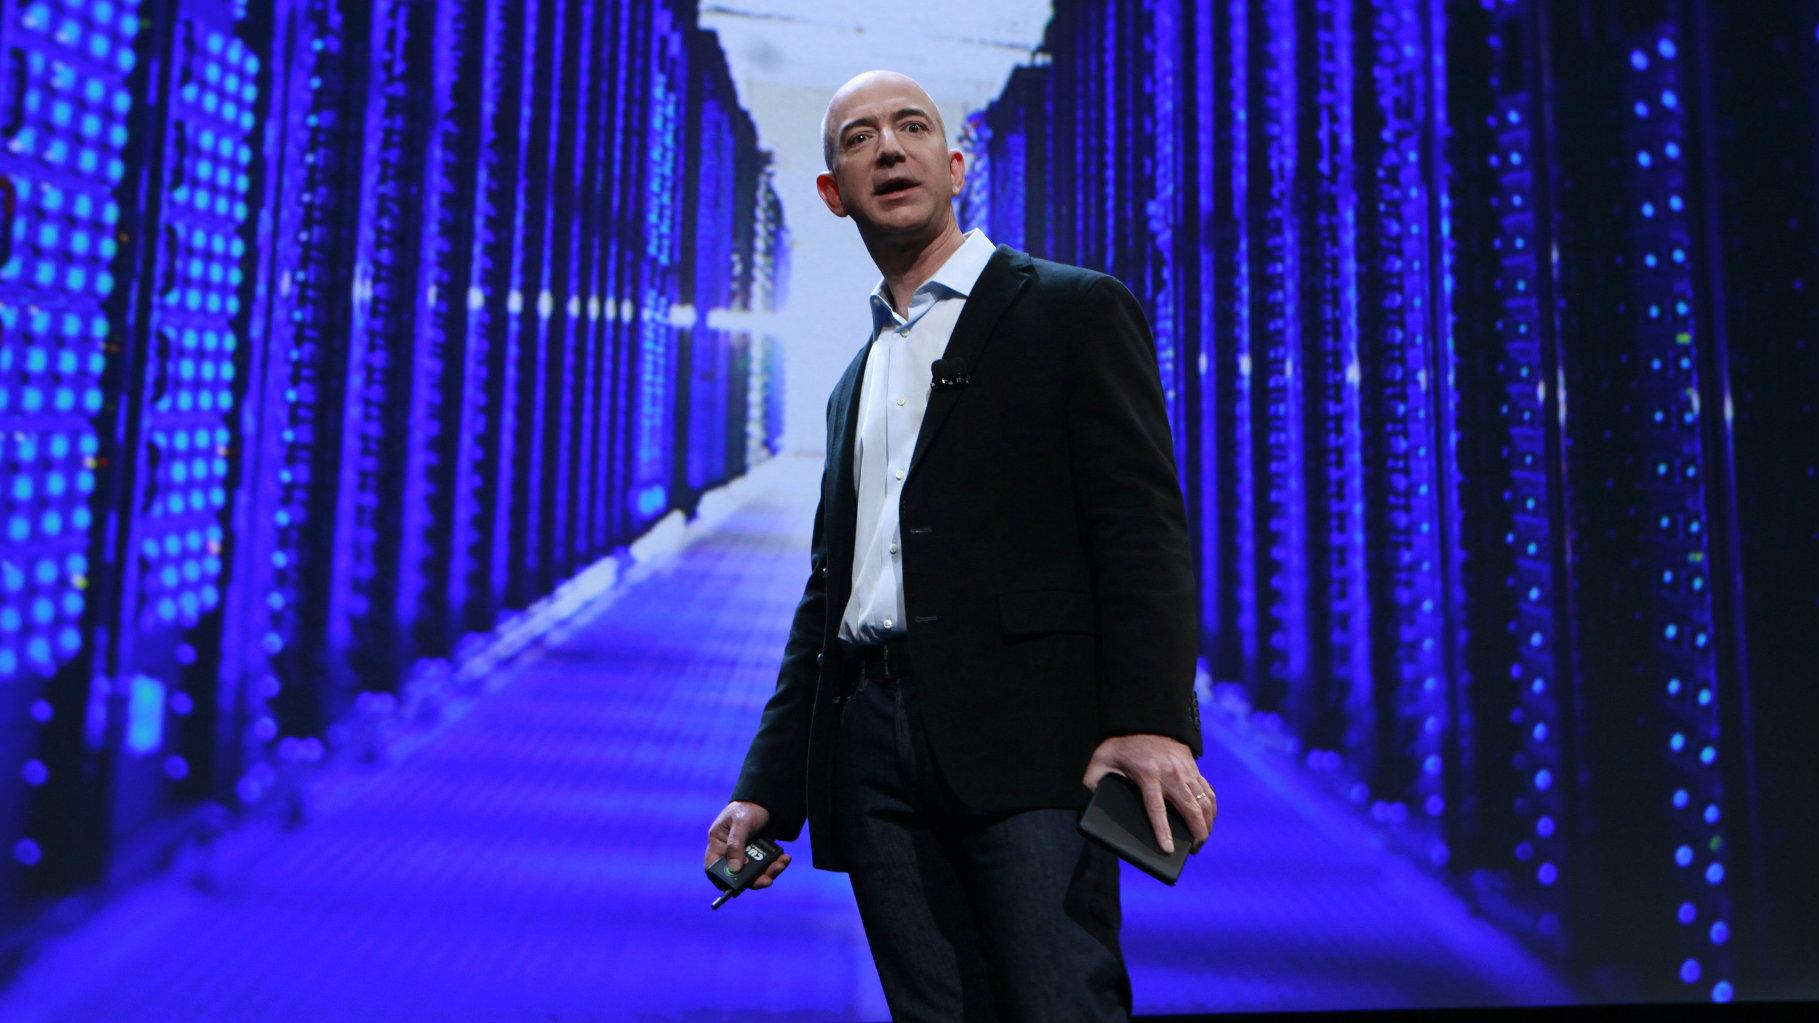 Jeff Bezos of Amazon delivers a speech